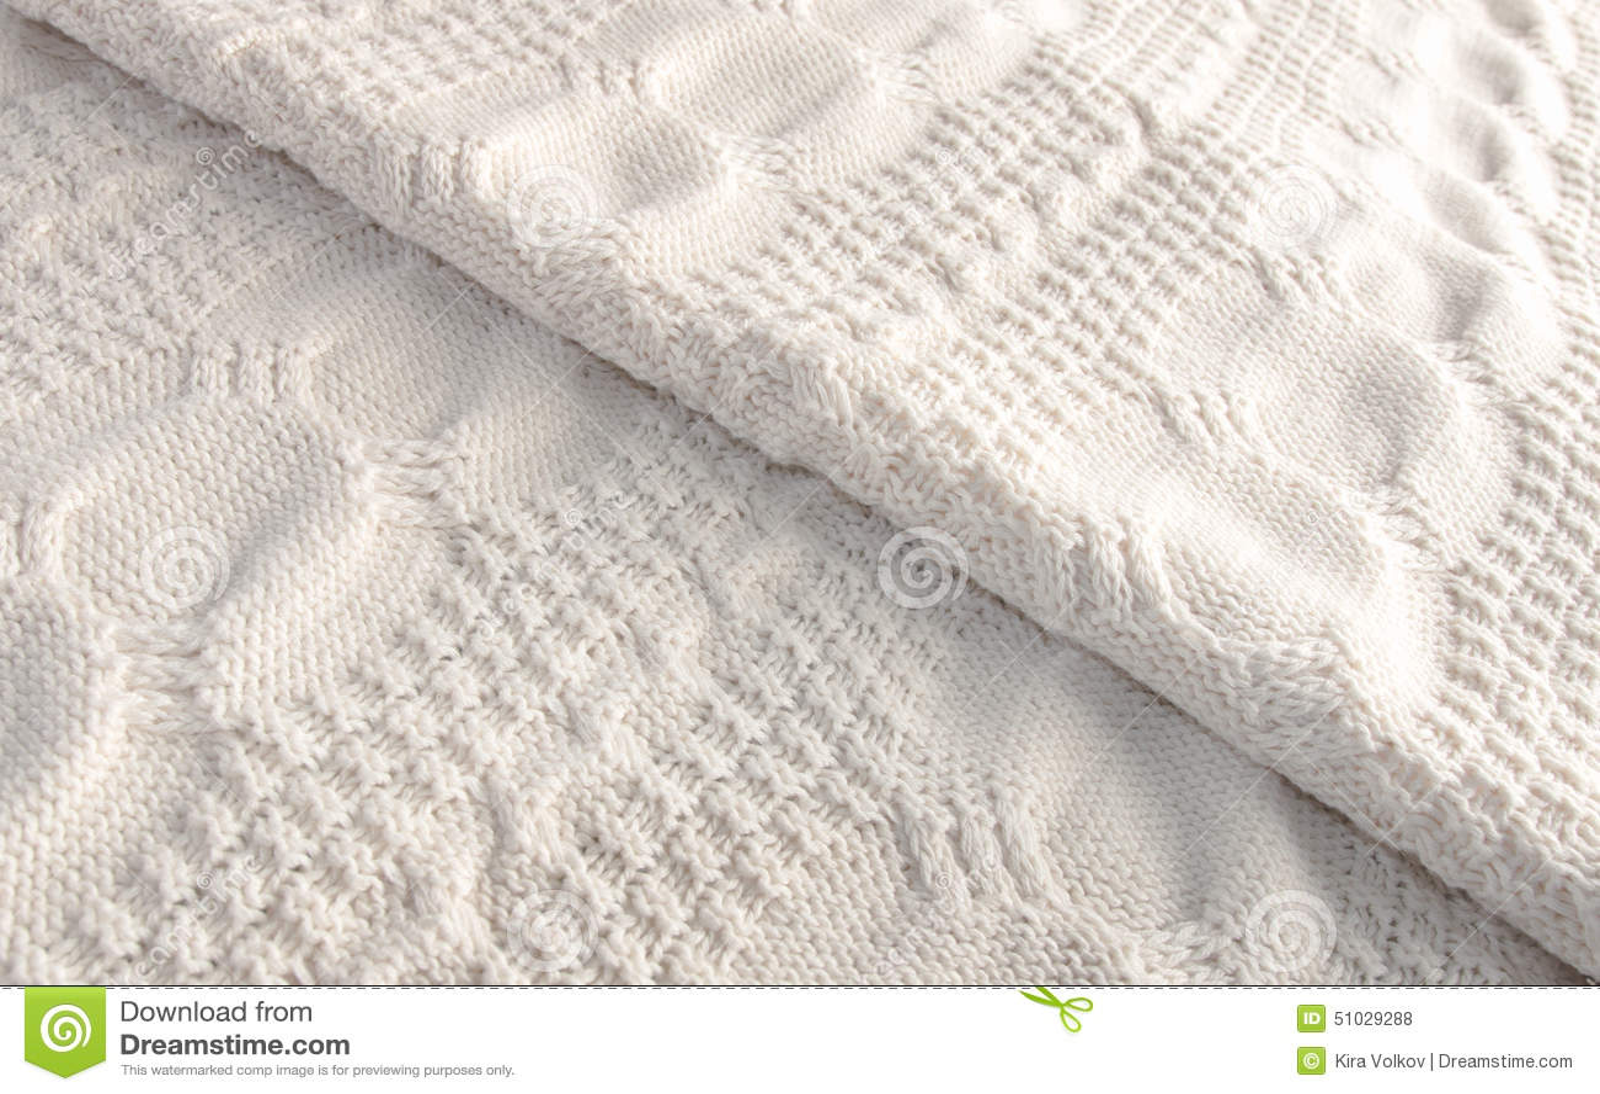 White Knitted Blanket Folded Diagonally Stock Photo